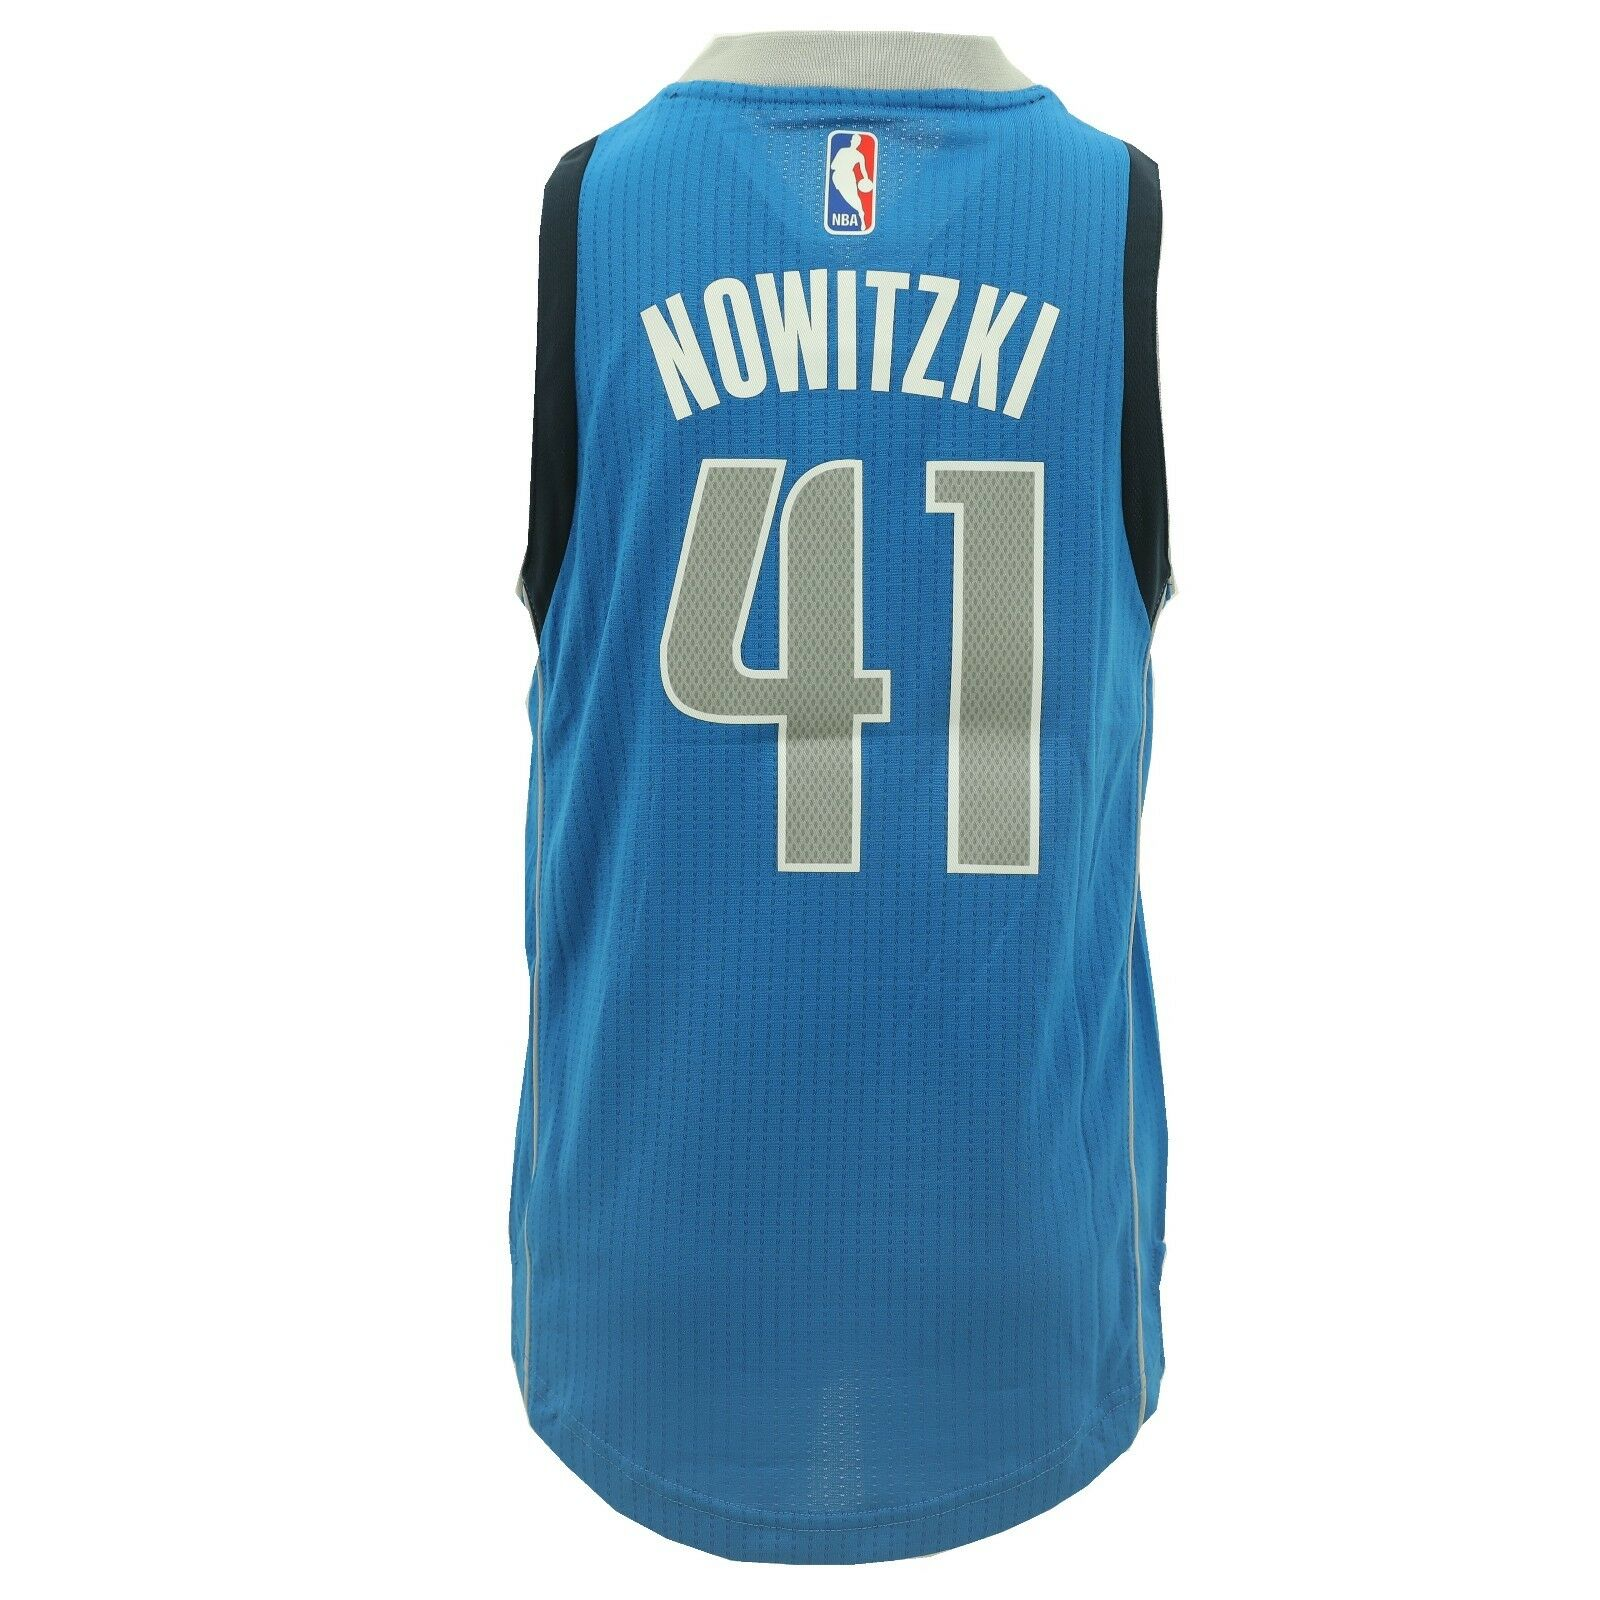 57baadcb7a874 Details about Dallas Mavericks Youth Size Dirk Nowitzki Swingman official  NBA +2